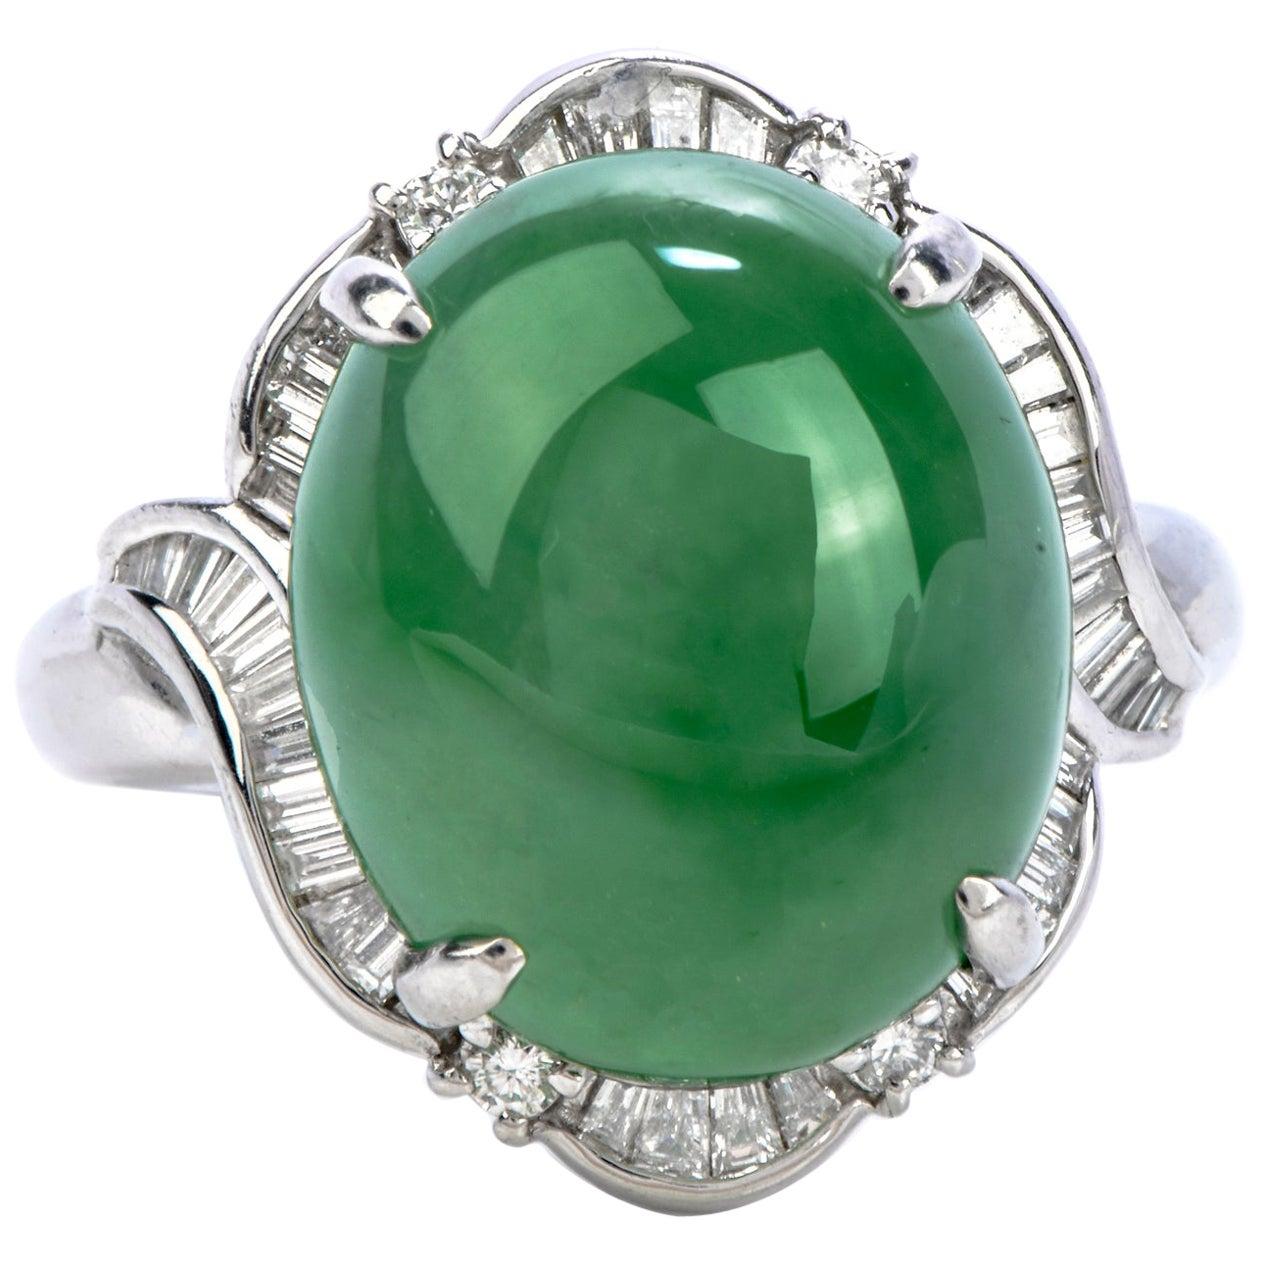 Certified GIA Green Jade Platinum Diamond Cocktail Ring